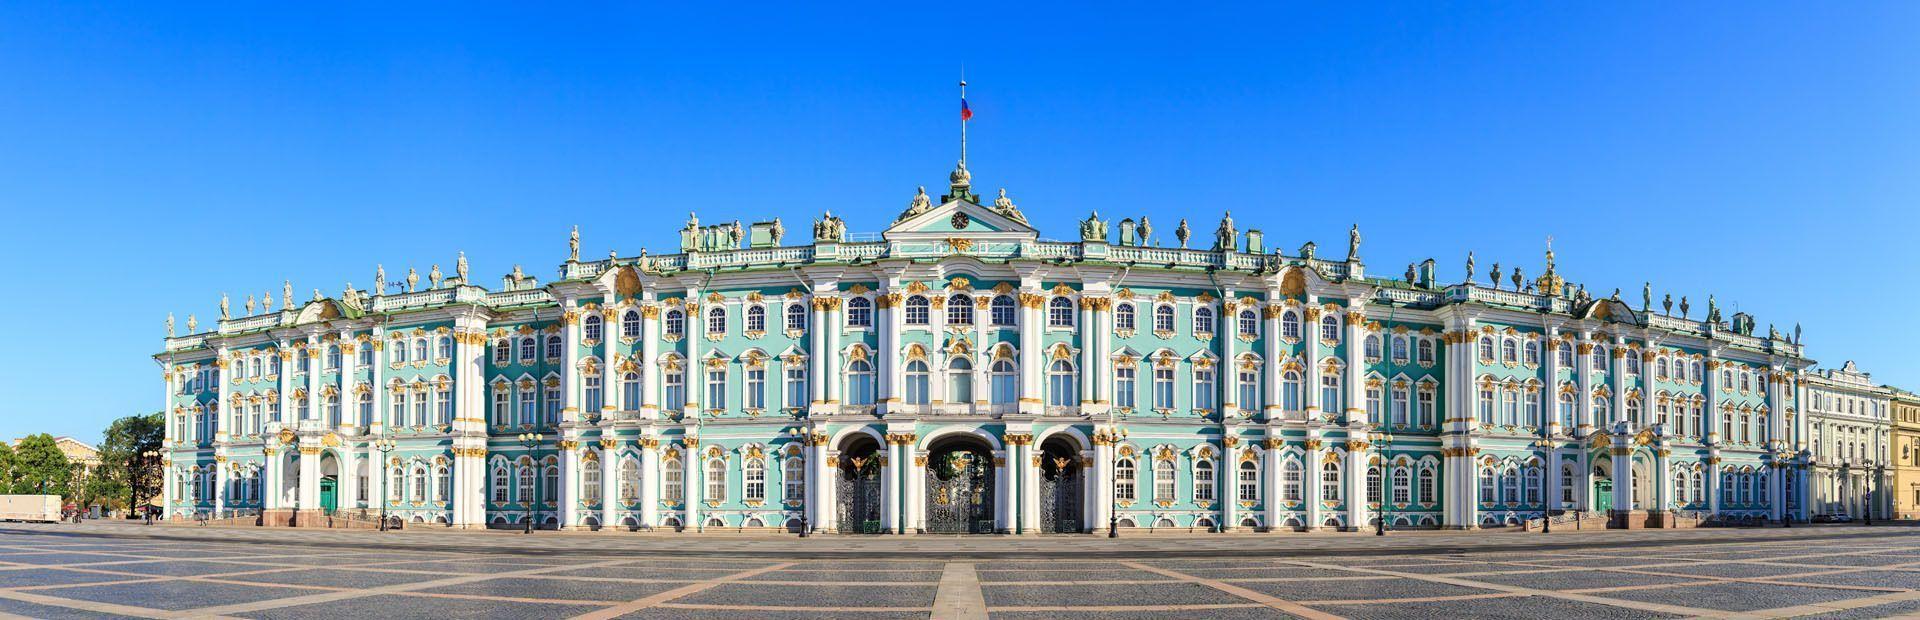 San Pietroburgo Express